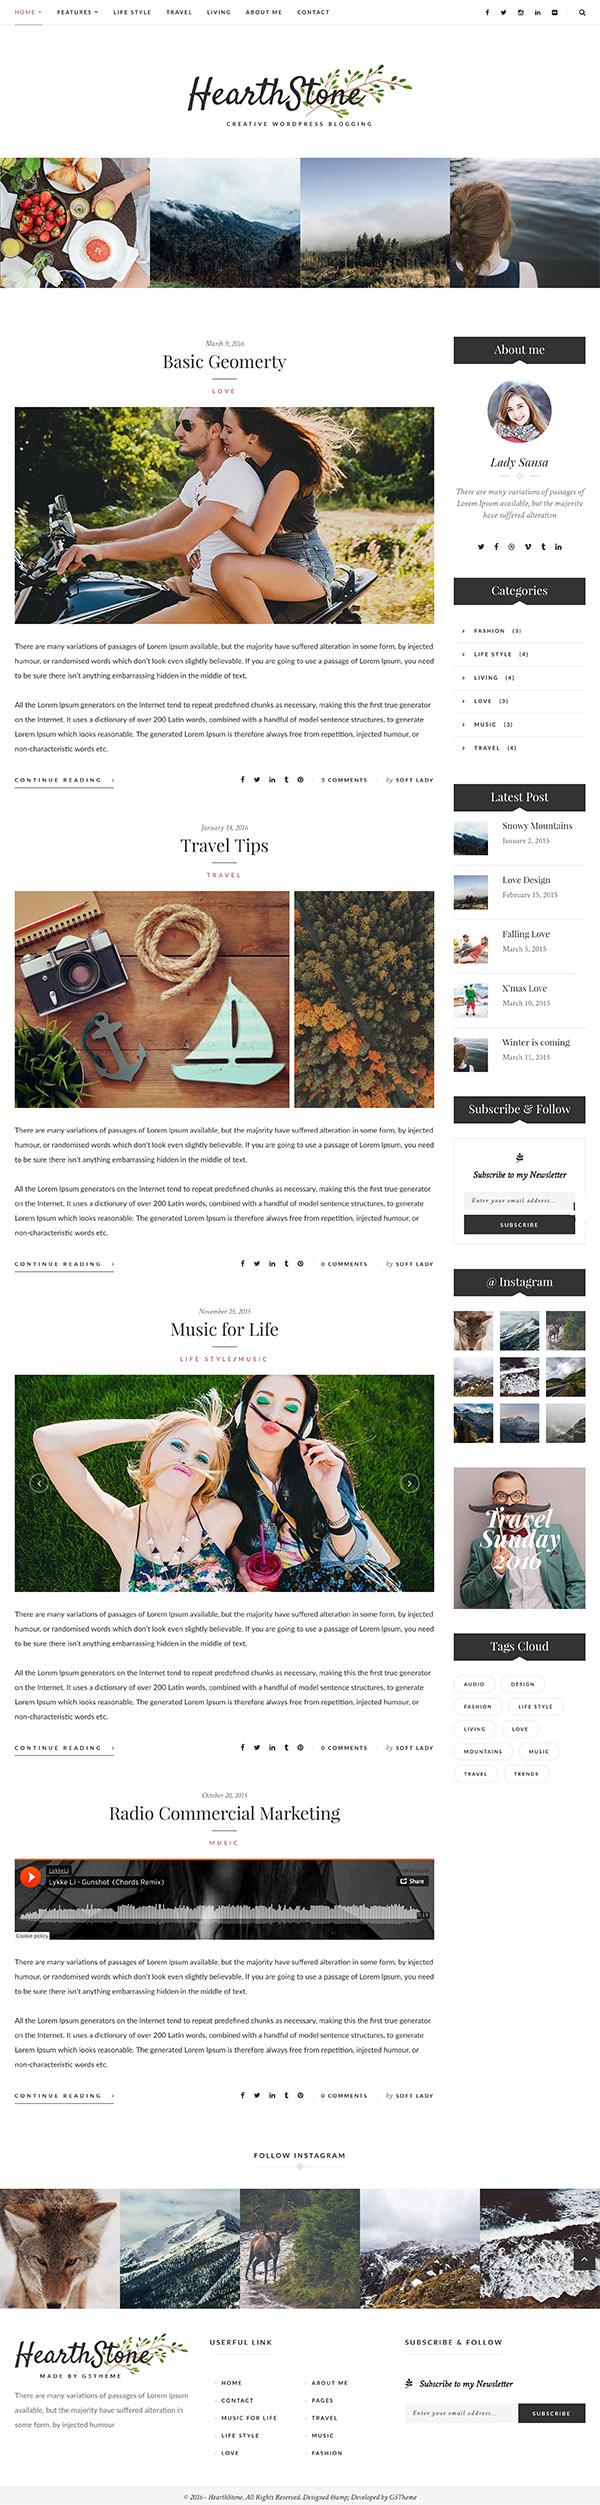 11 HearthStone - Responsive WordPress Blog Theme